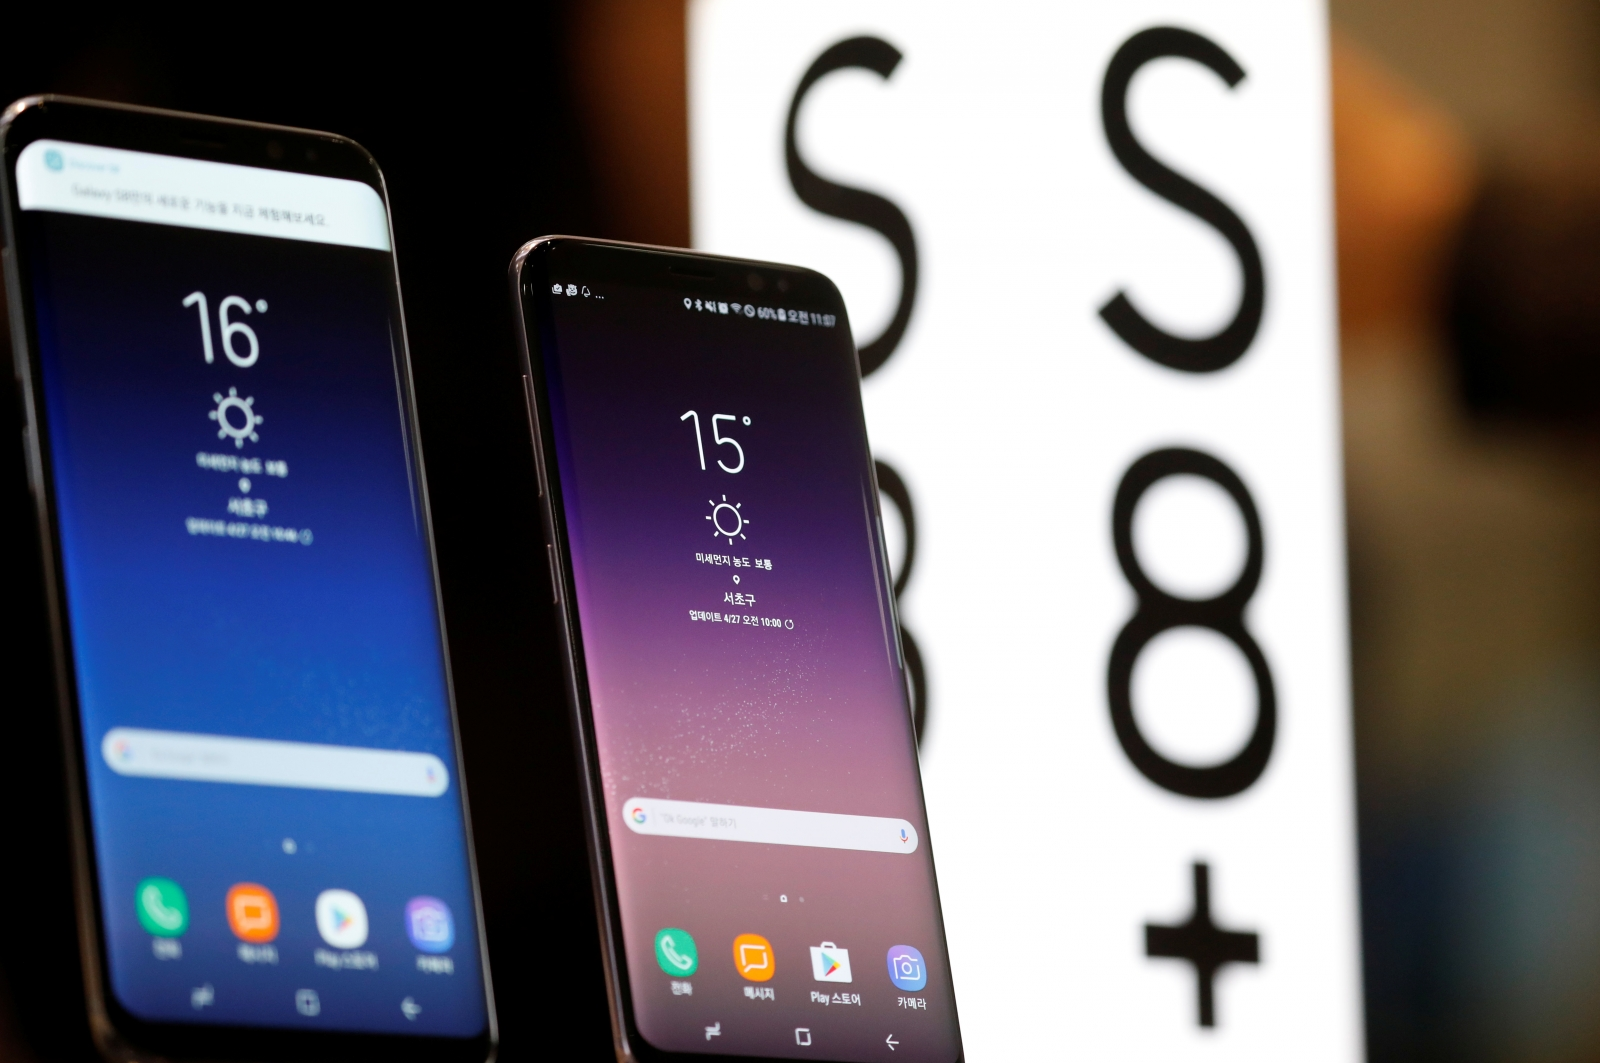 Galaxy S8 audio cut off problem